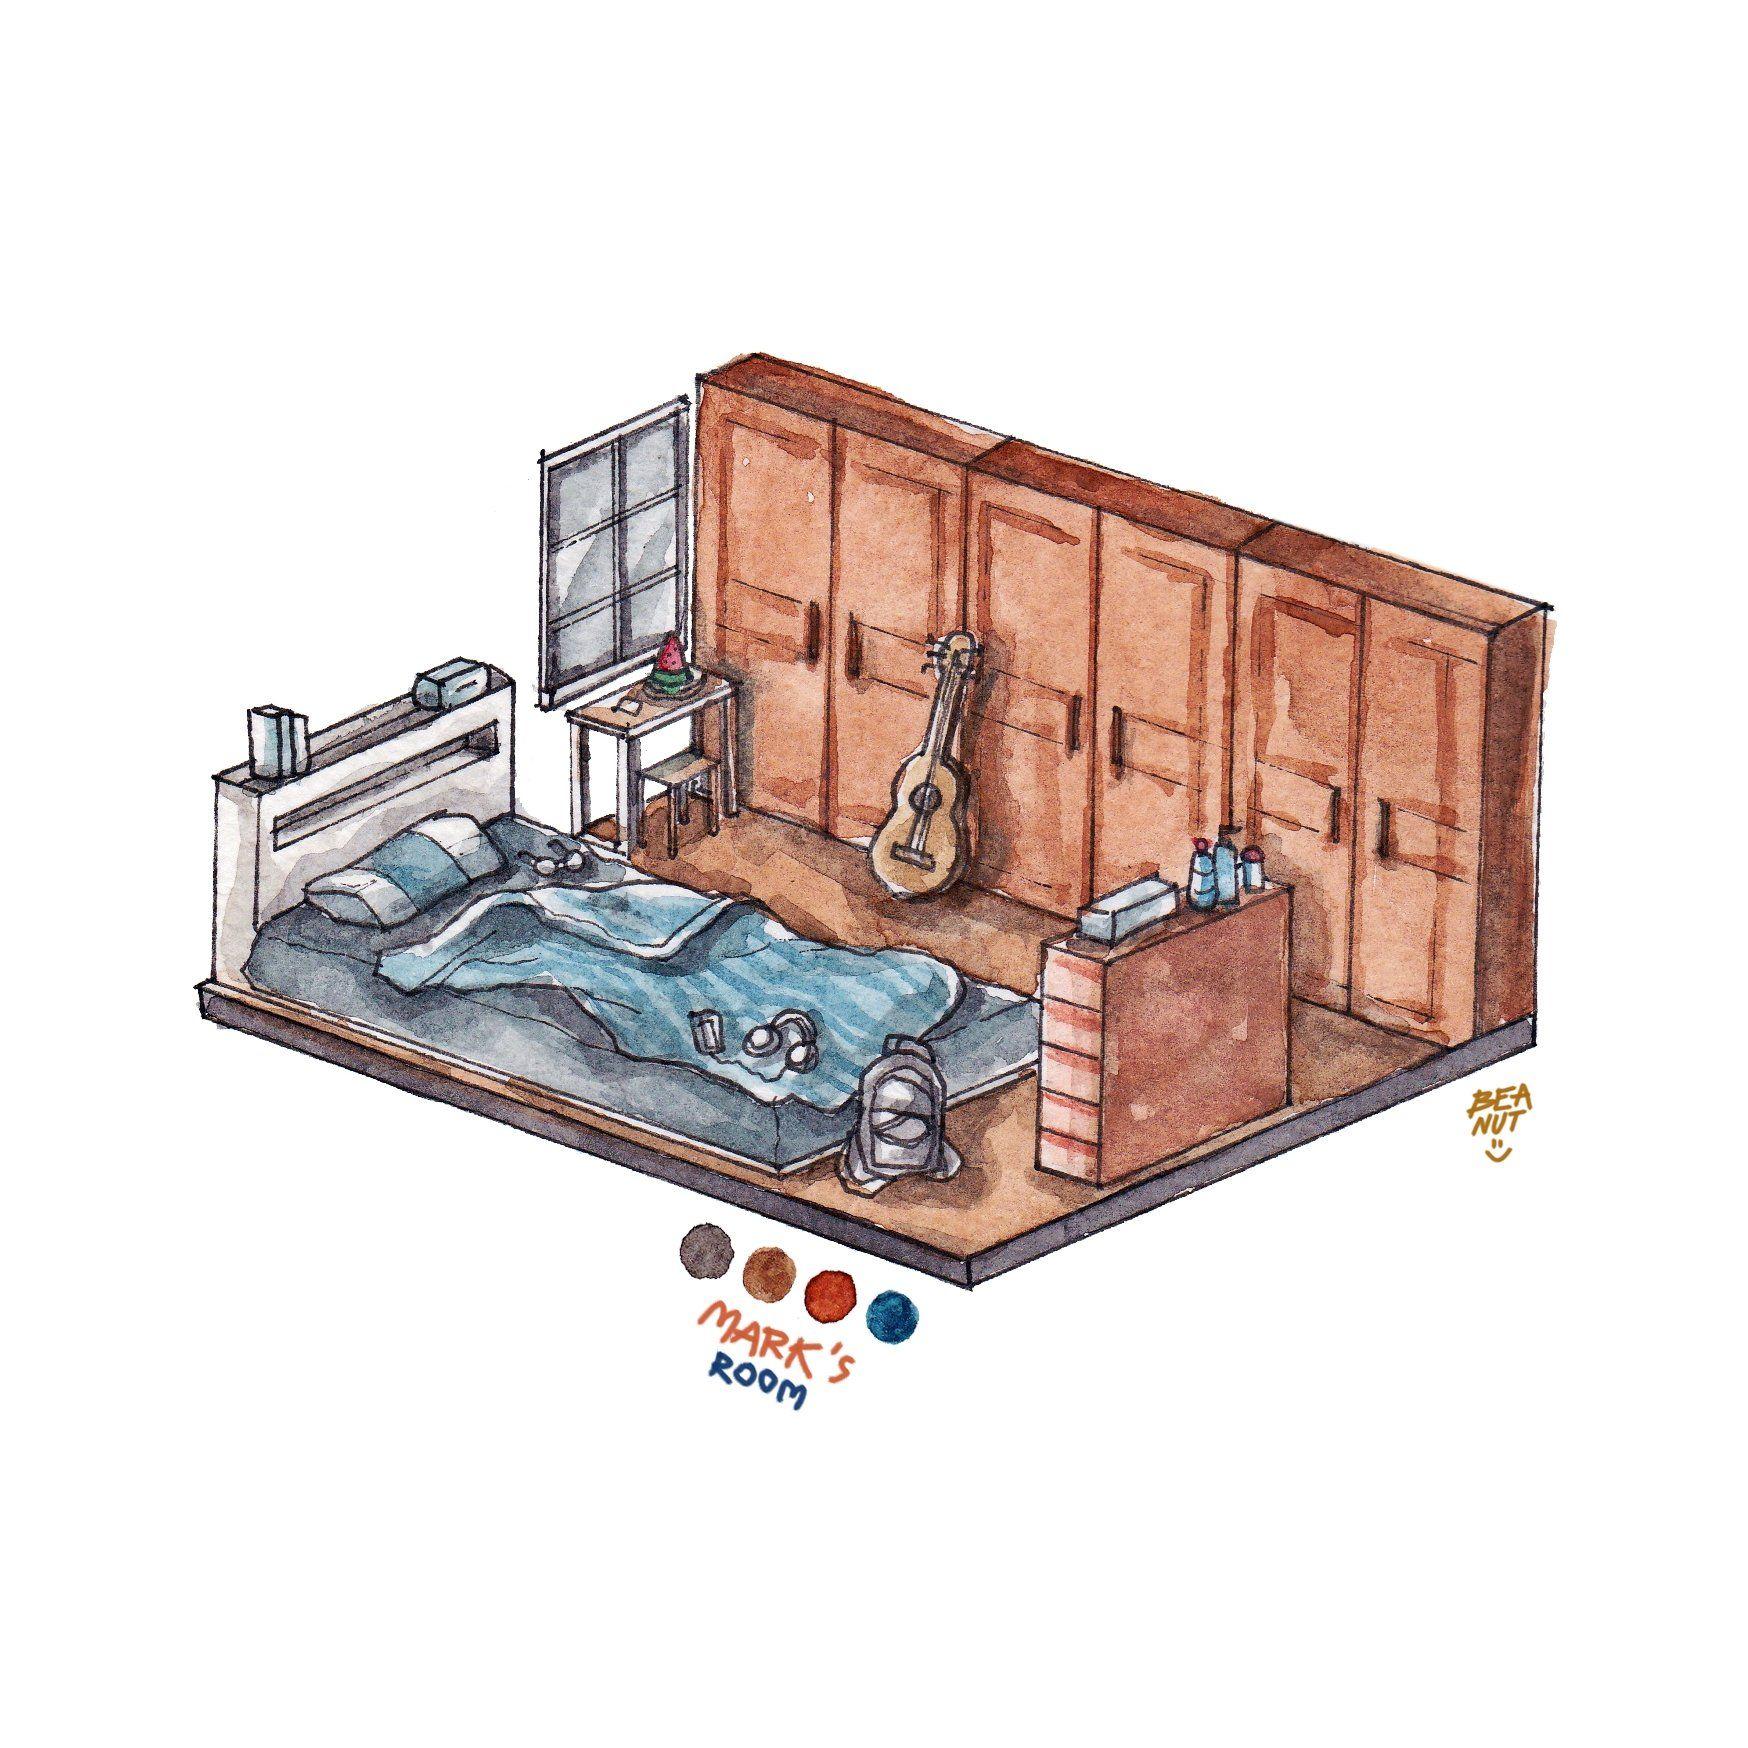 Beanut E13 Nctbacktoschool2020 On Twitter Nct Aesthetic Rooms Room Inspiration Bedroom